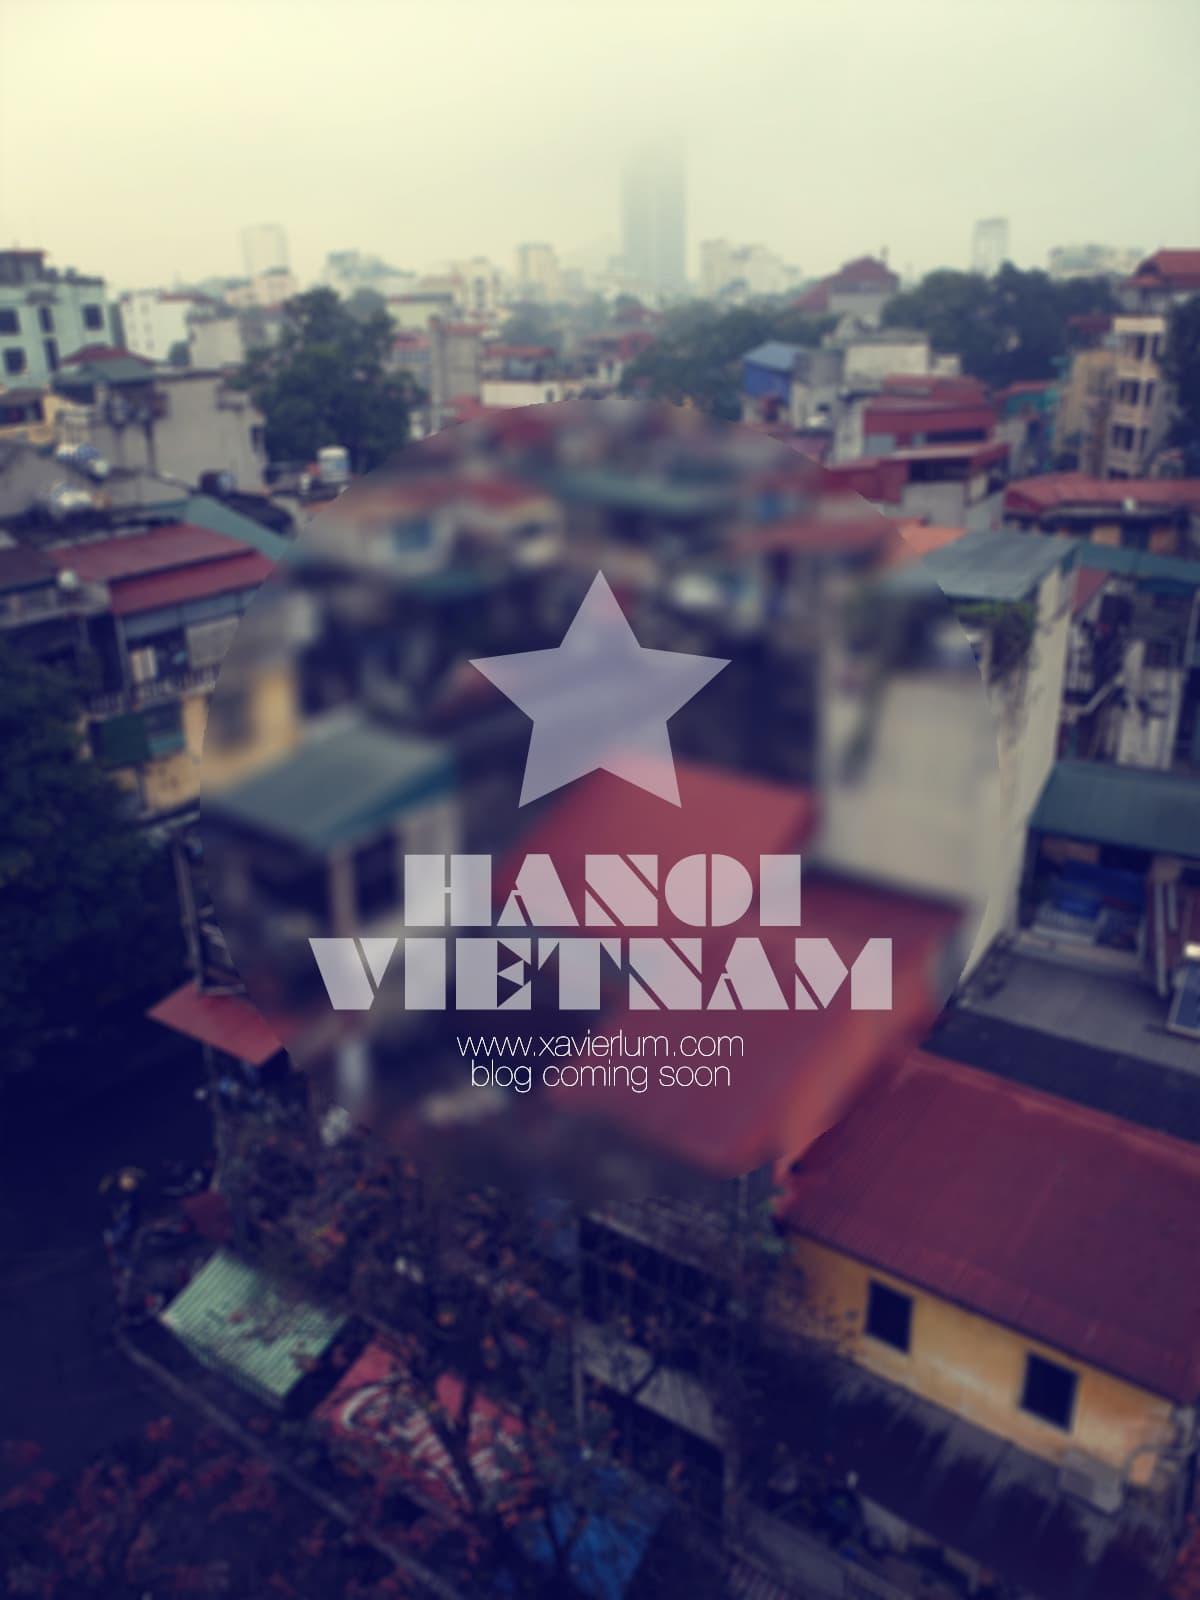 Travel to Hanoi – Coming Soon